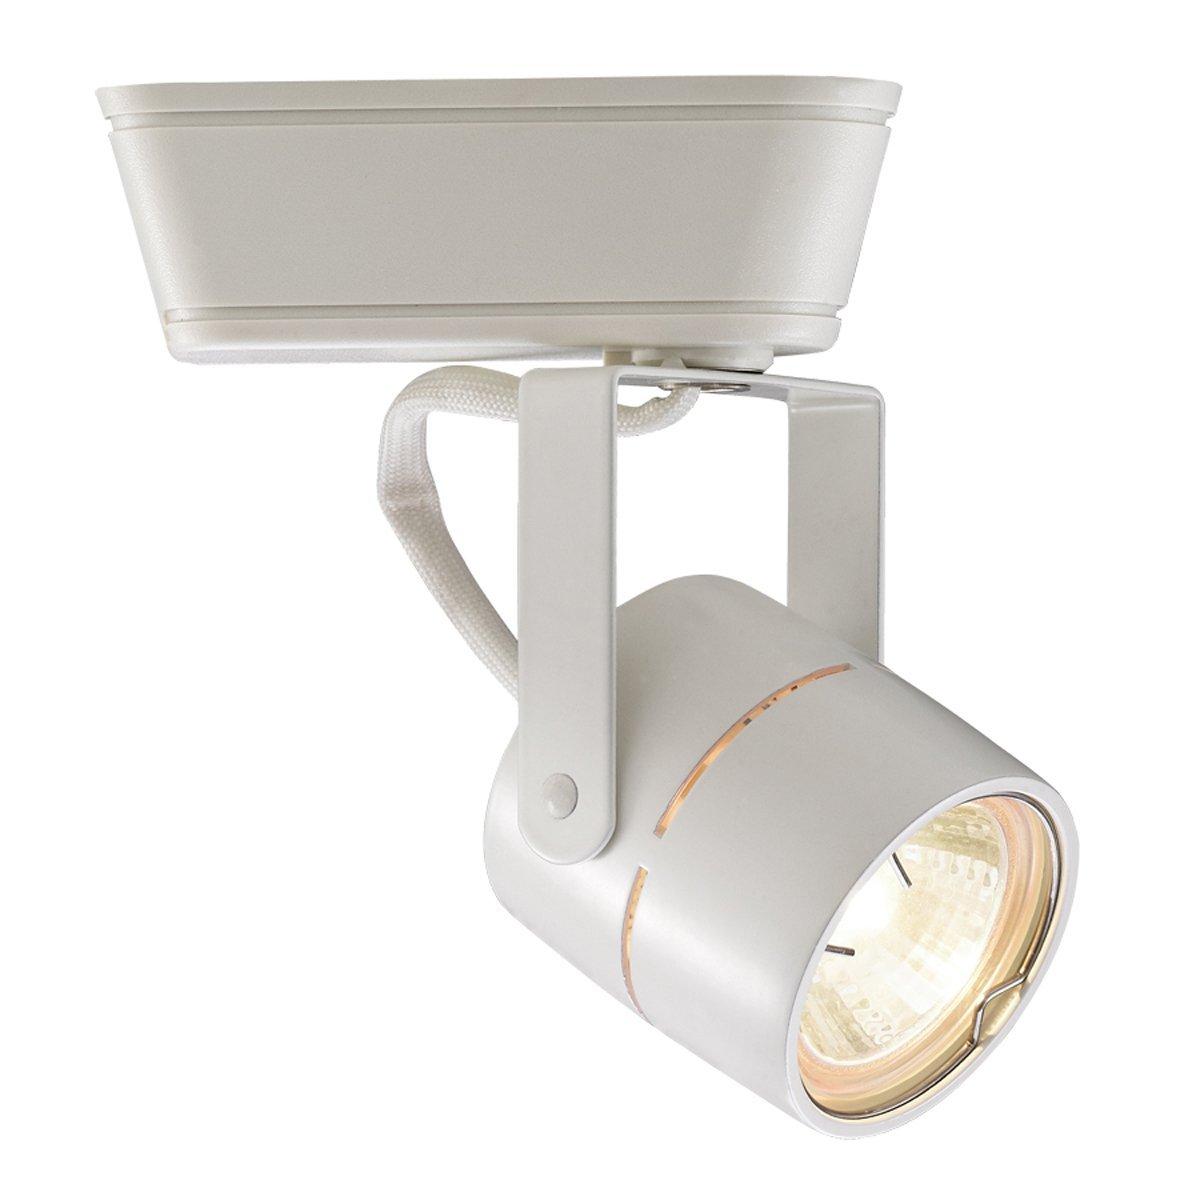 WAC Lighting HHT-809-WT H Series Low Voltage Track Head, 50W